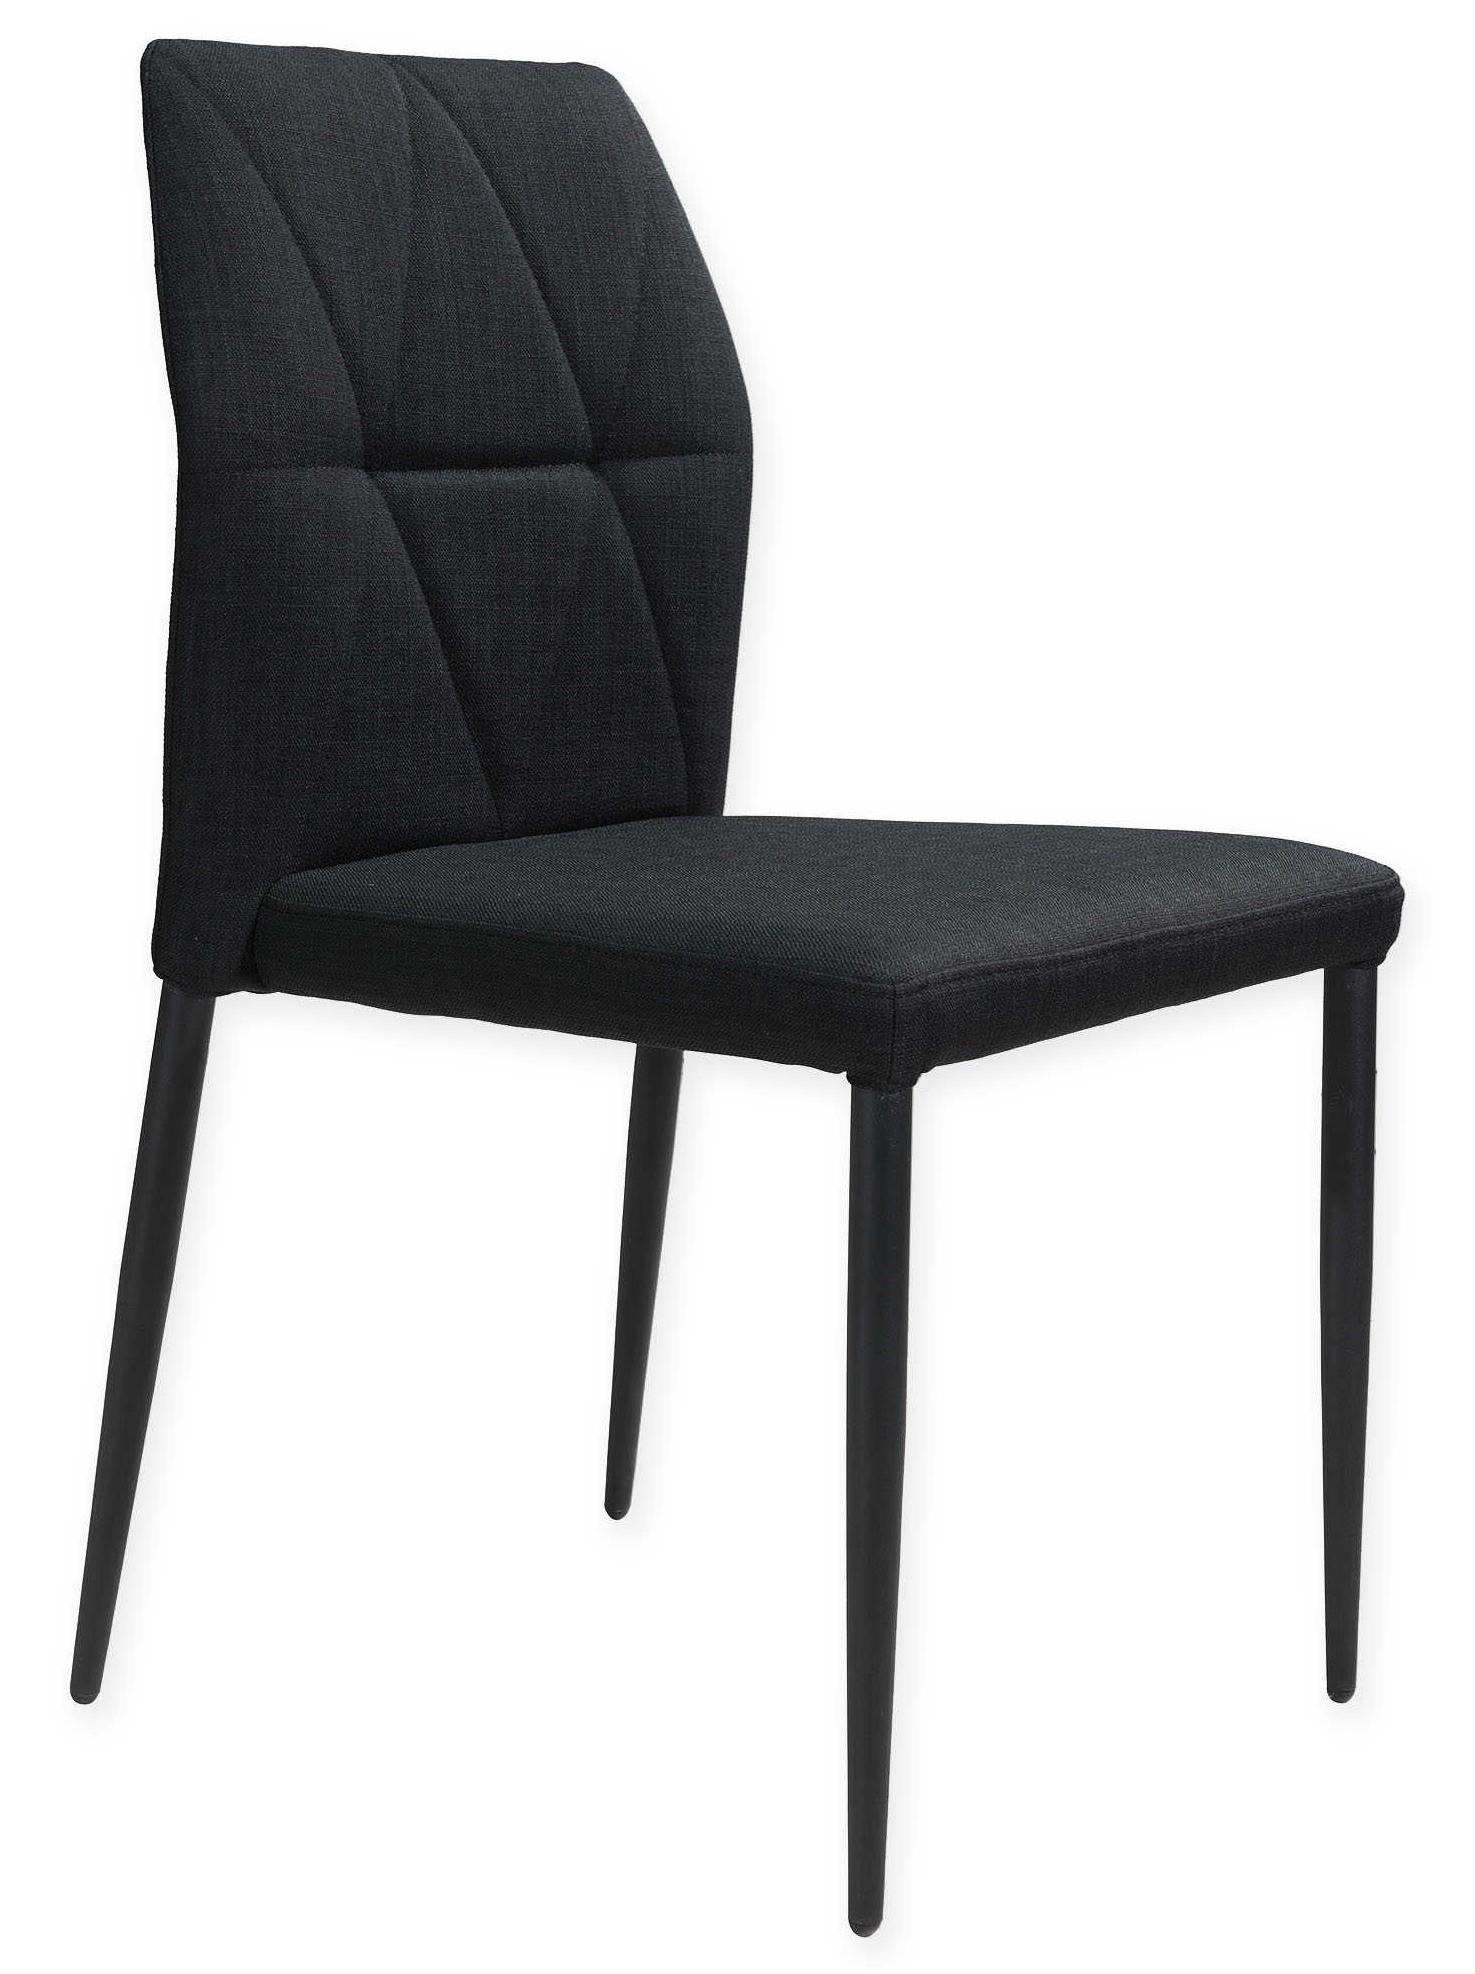 revolution dining chair black